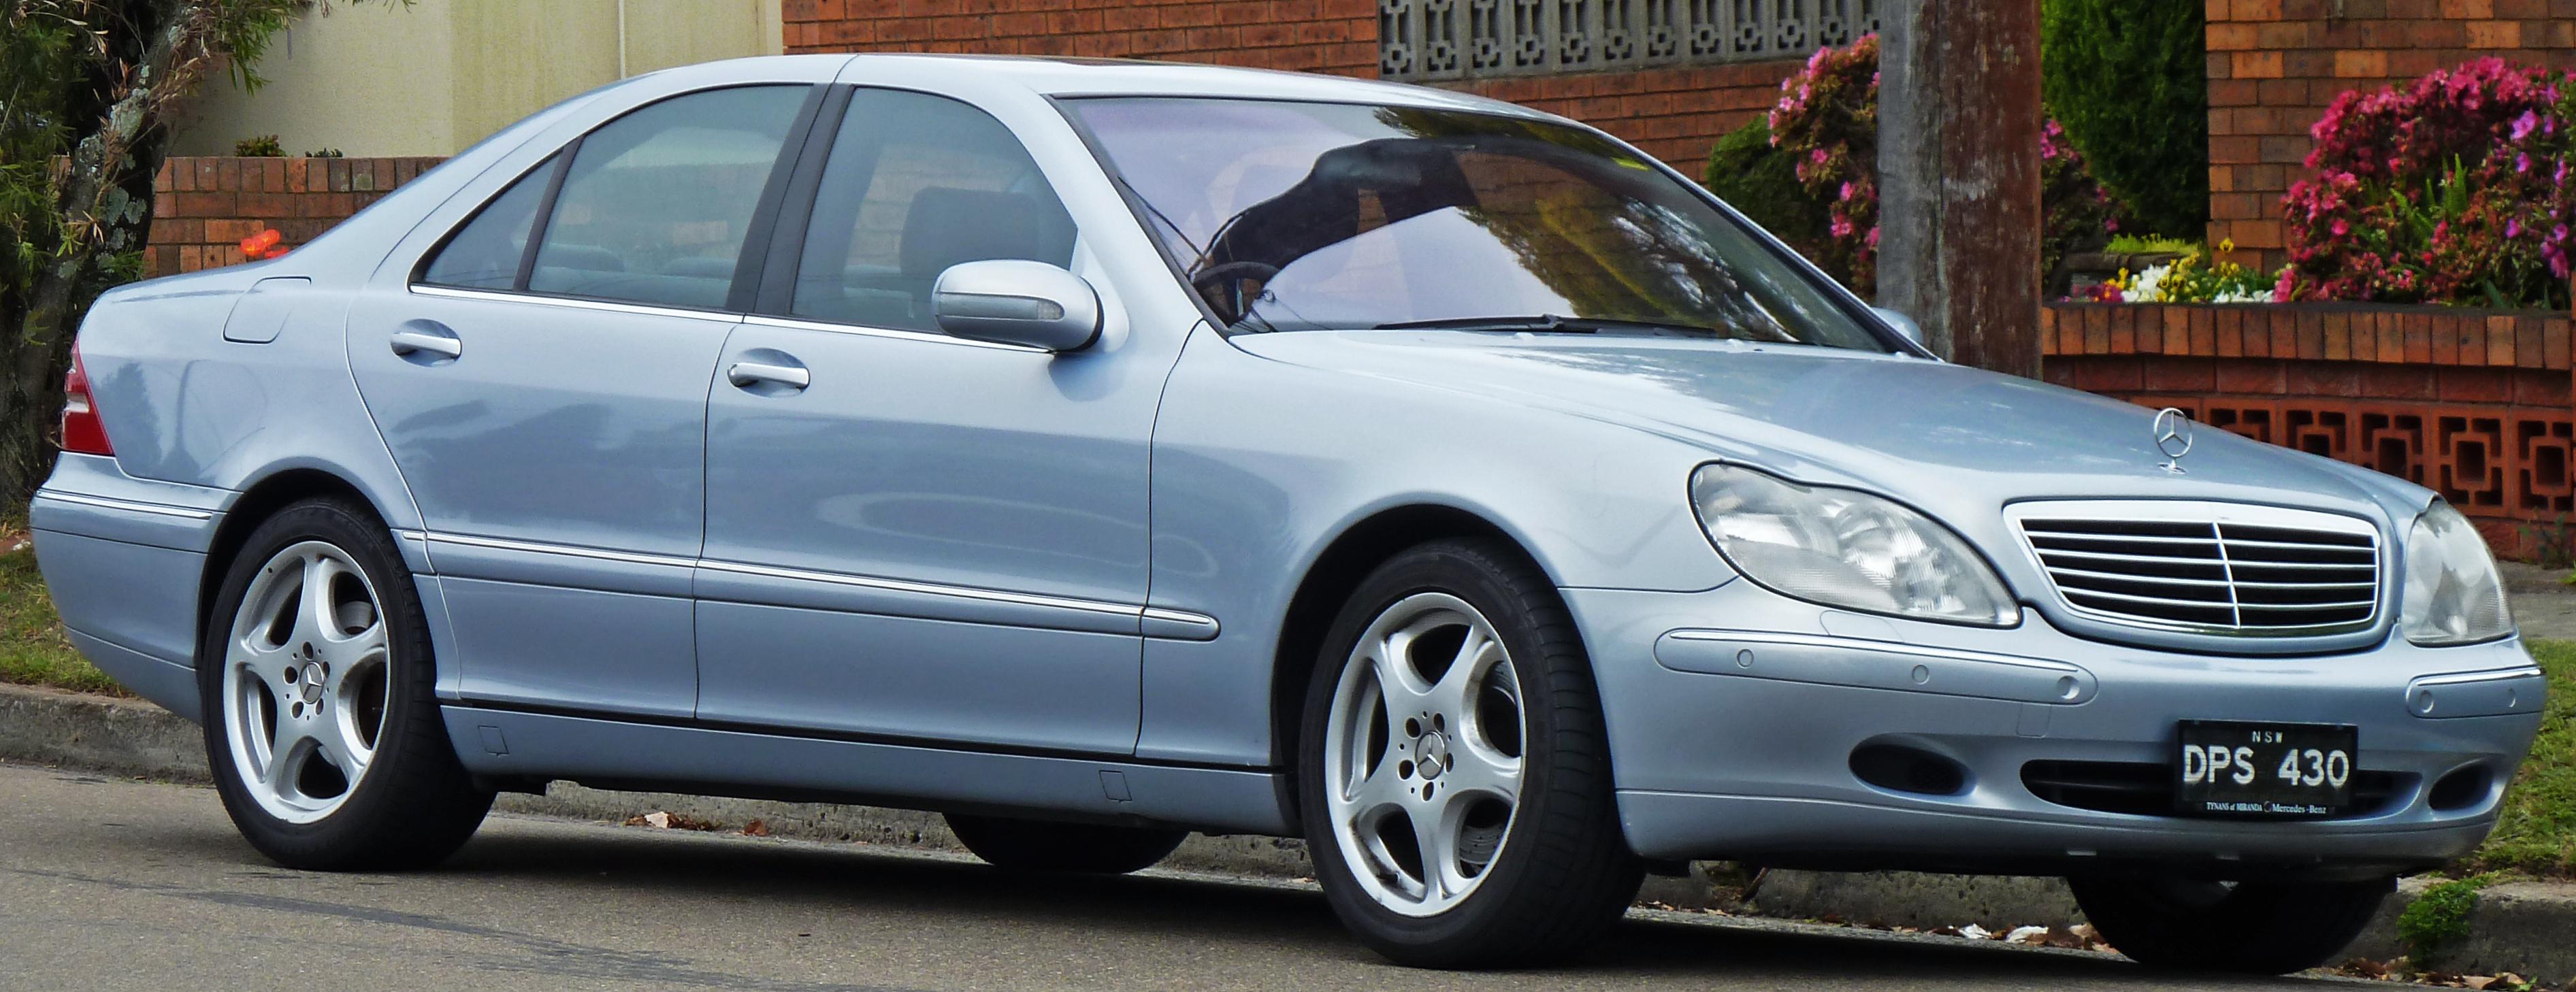 Mercedes-Benz S-Class (W220) - Wikiwand